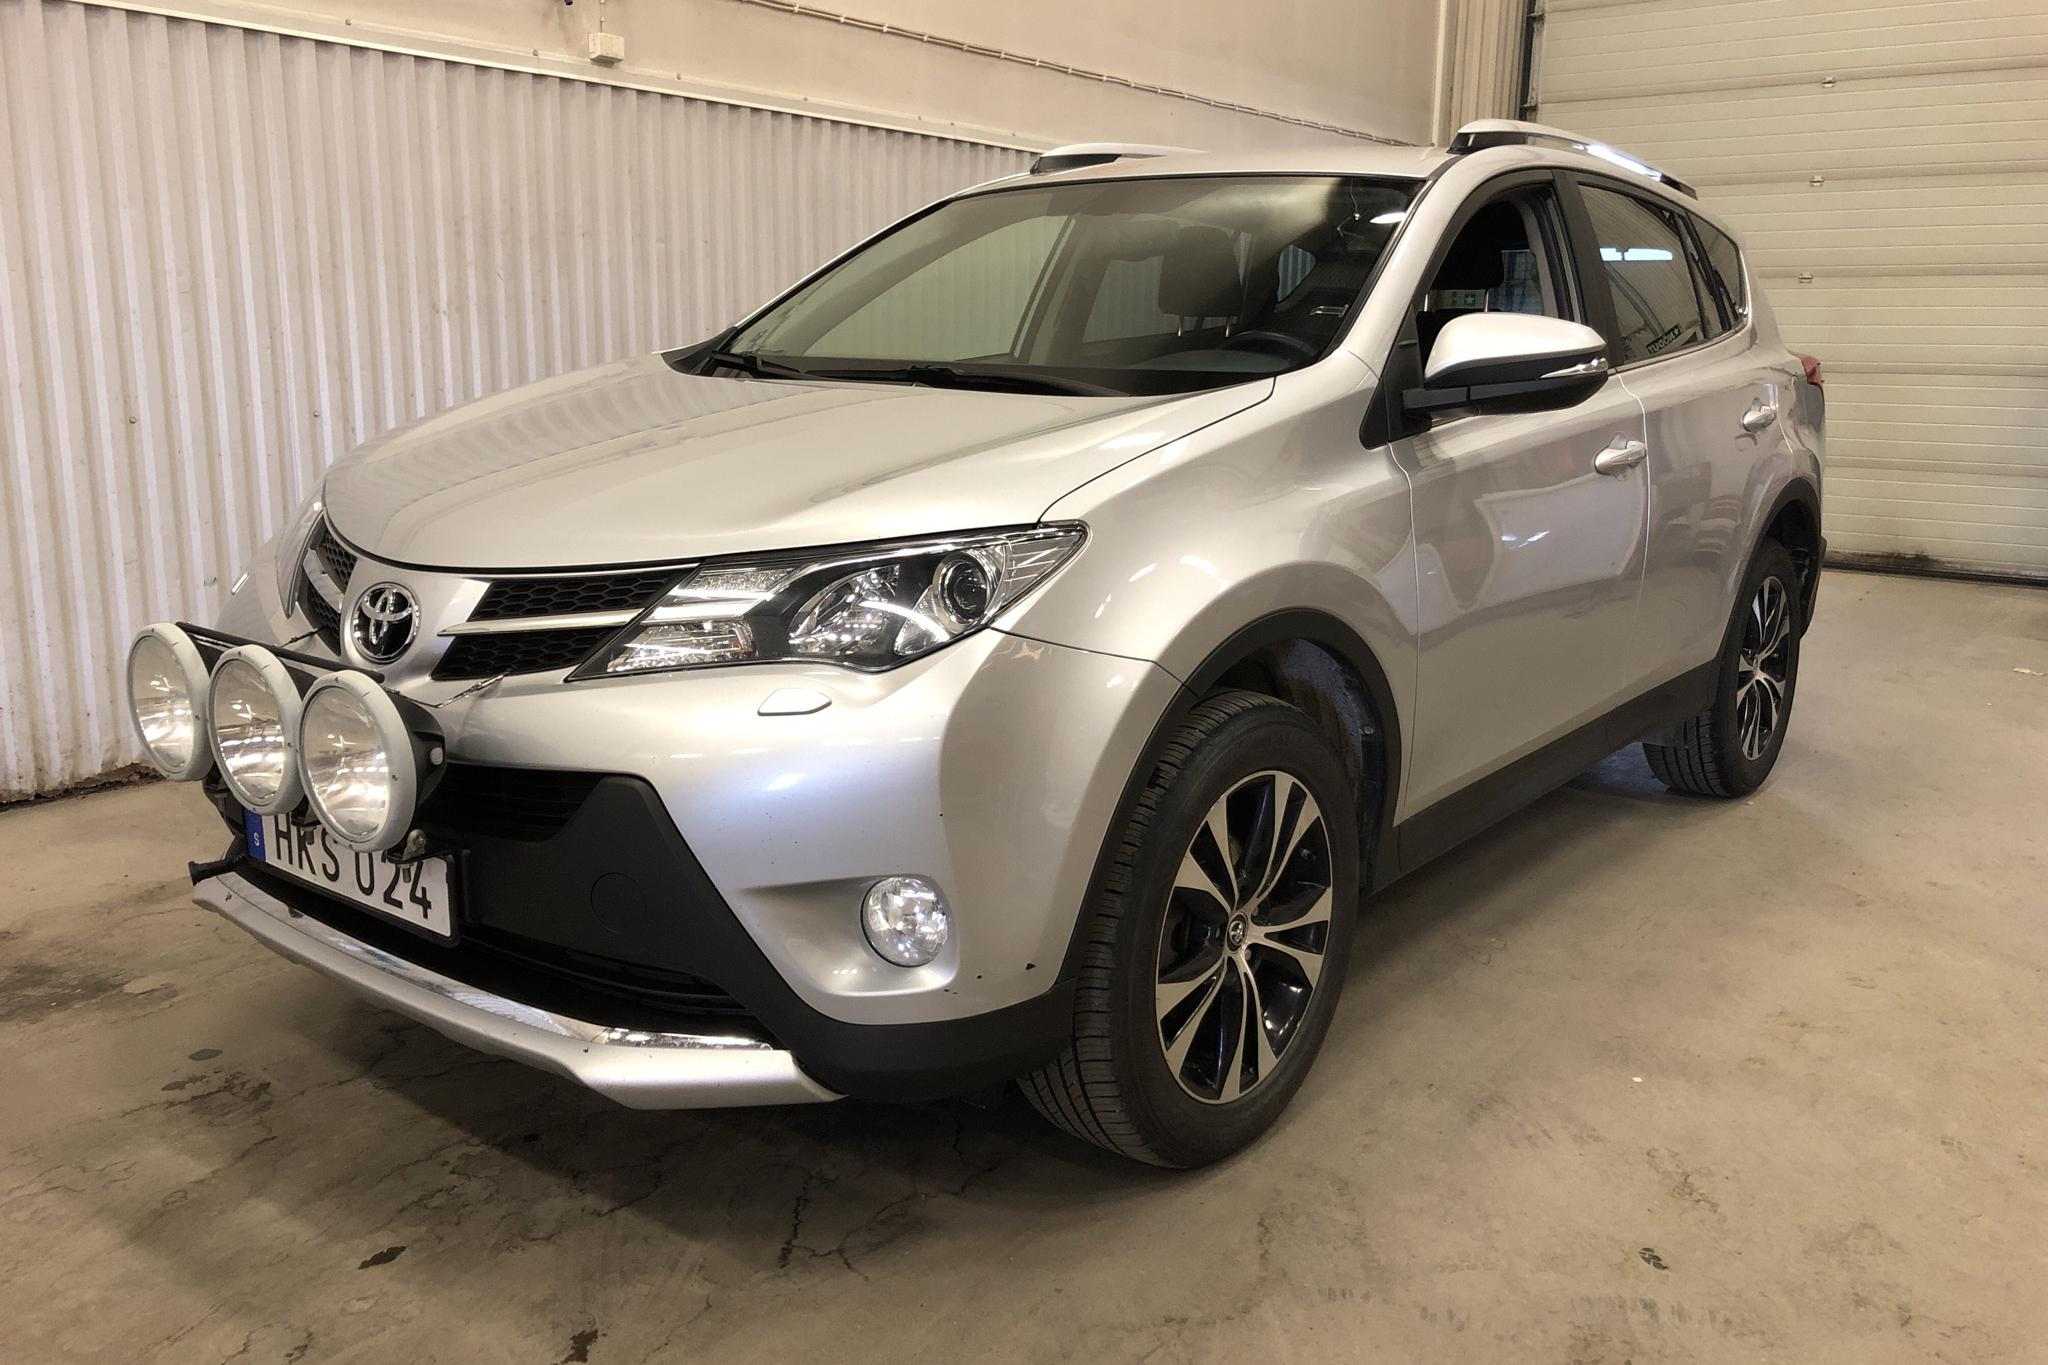 Toyota RAV4 2.0 D-4D DPF (121hk) - 82 110 km - Manual - silver - 2015